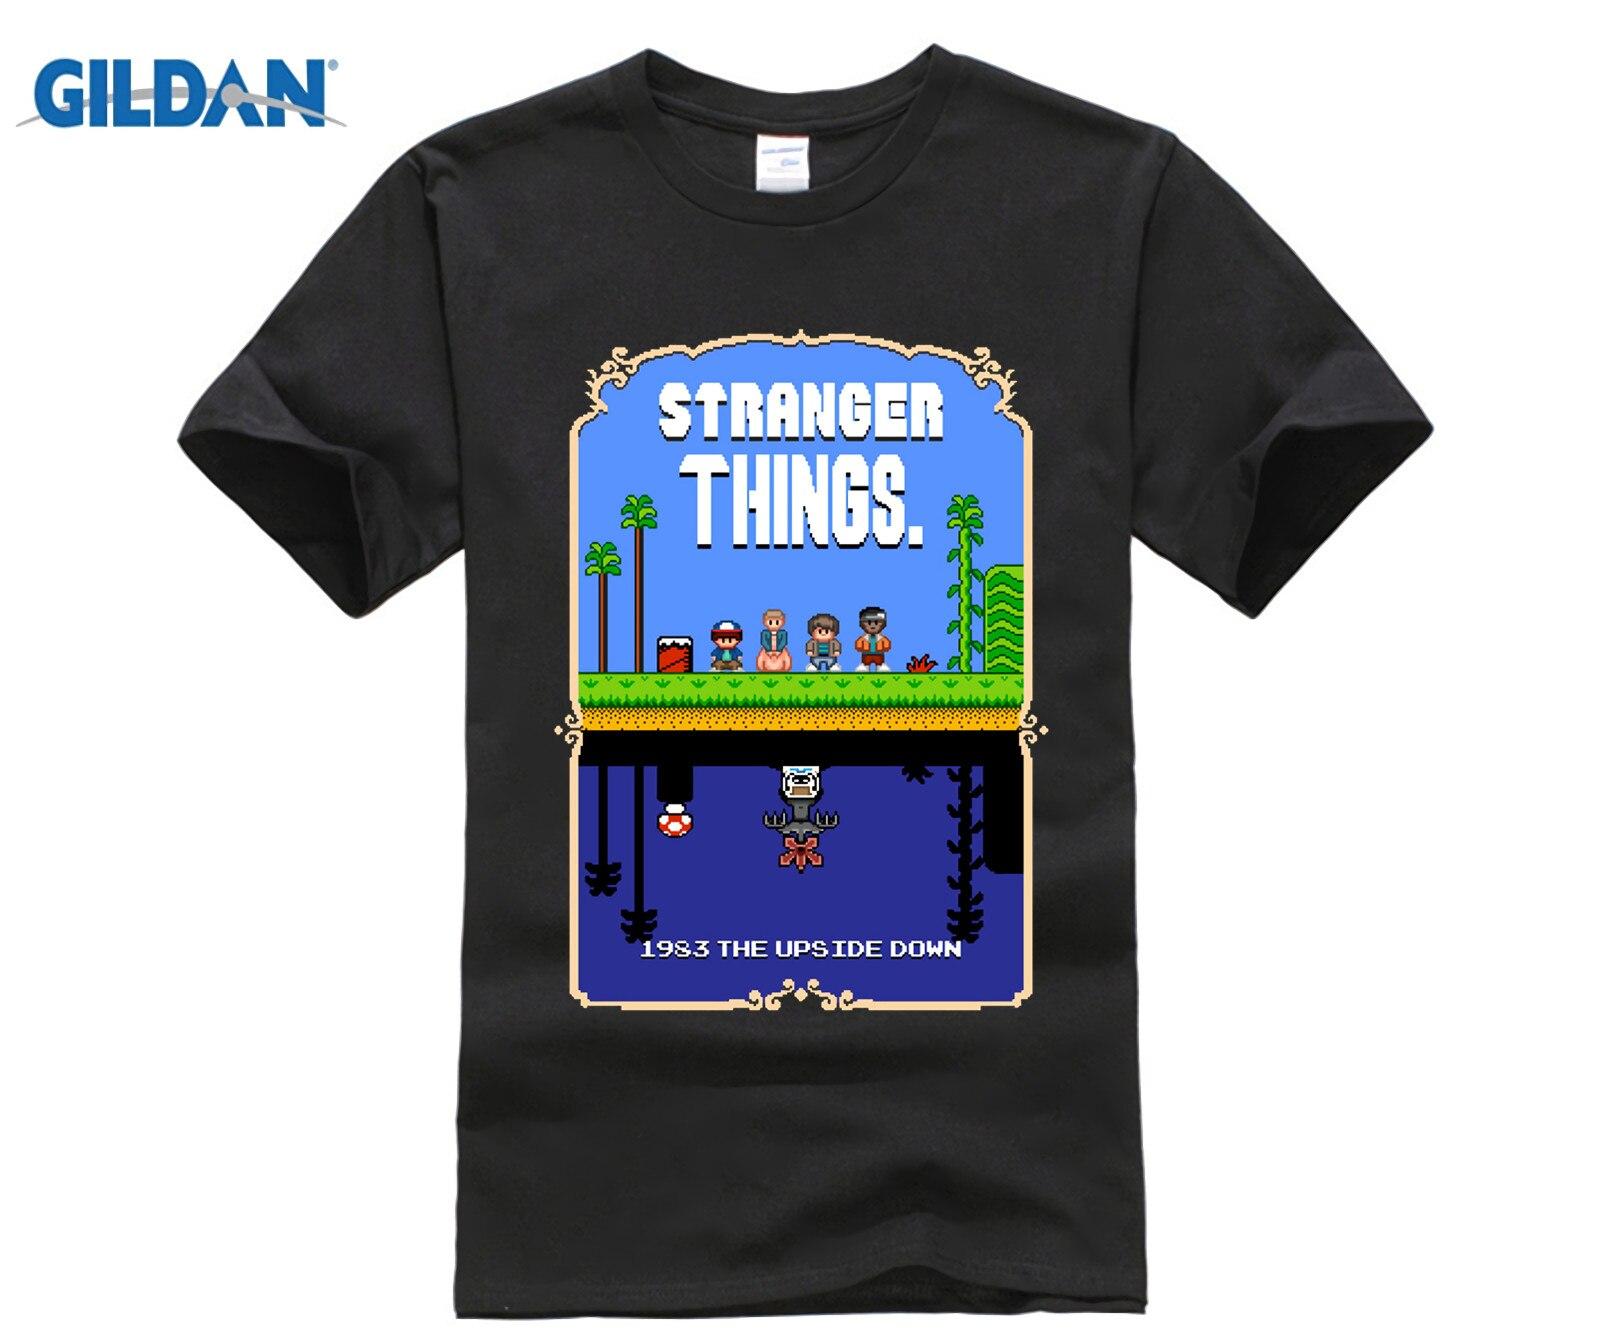 Gildan 100 Cotton O Neck Printed T Shirt Stranger Things